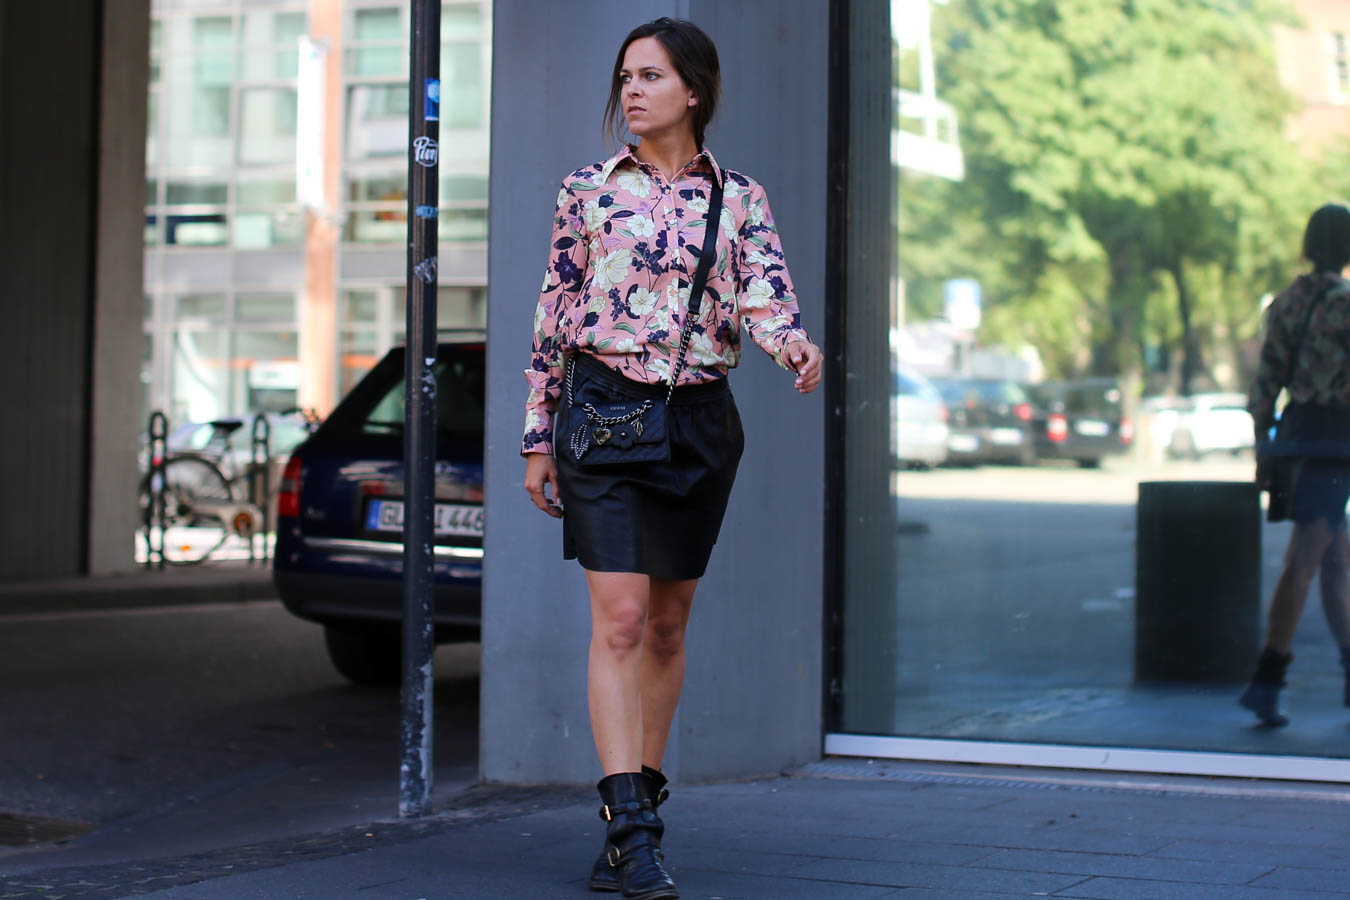 #Fashion | ♡ Lederrock + 20 Fakten über mich.